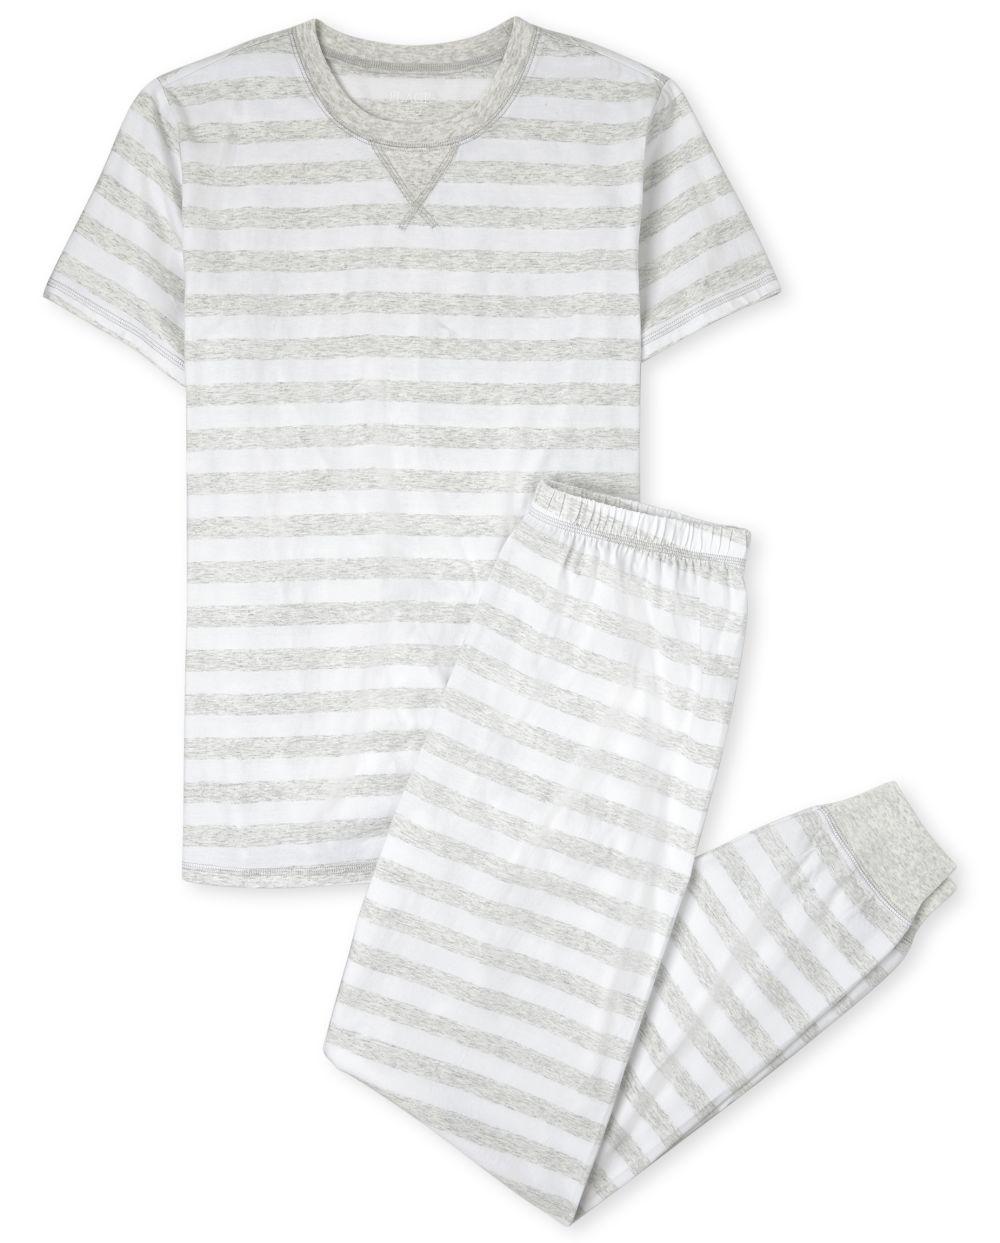 Unisex Adult Matching Family Striped Cotton Pajamas - Gray